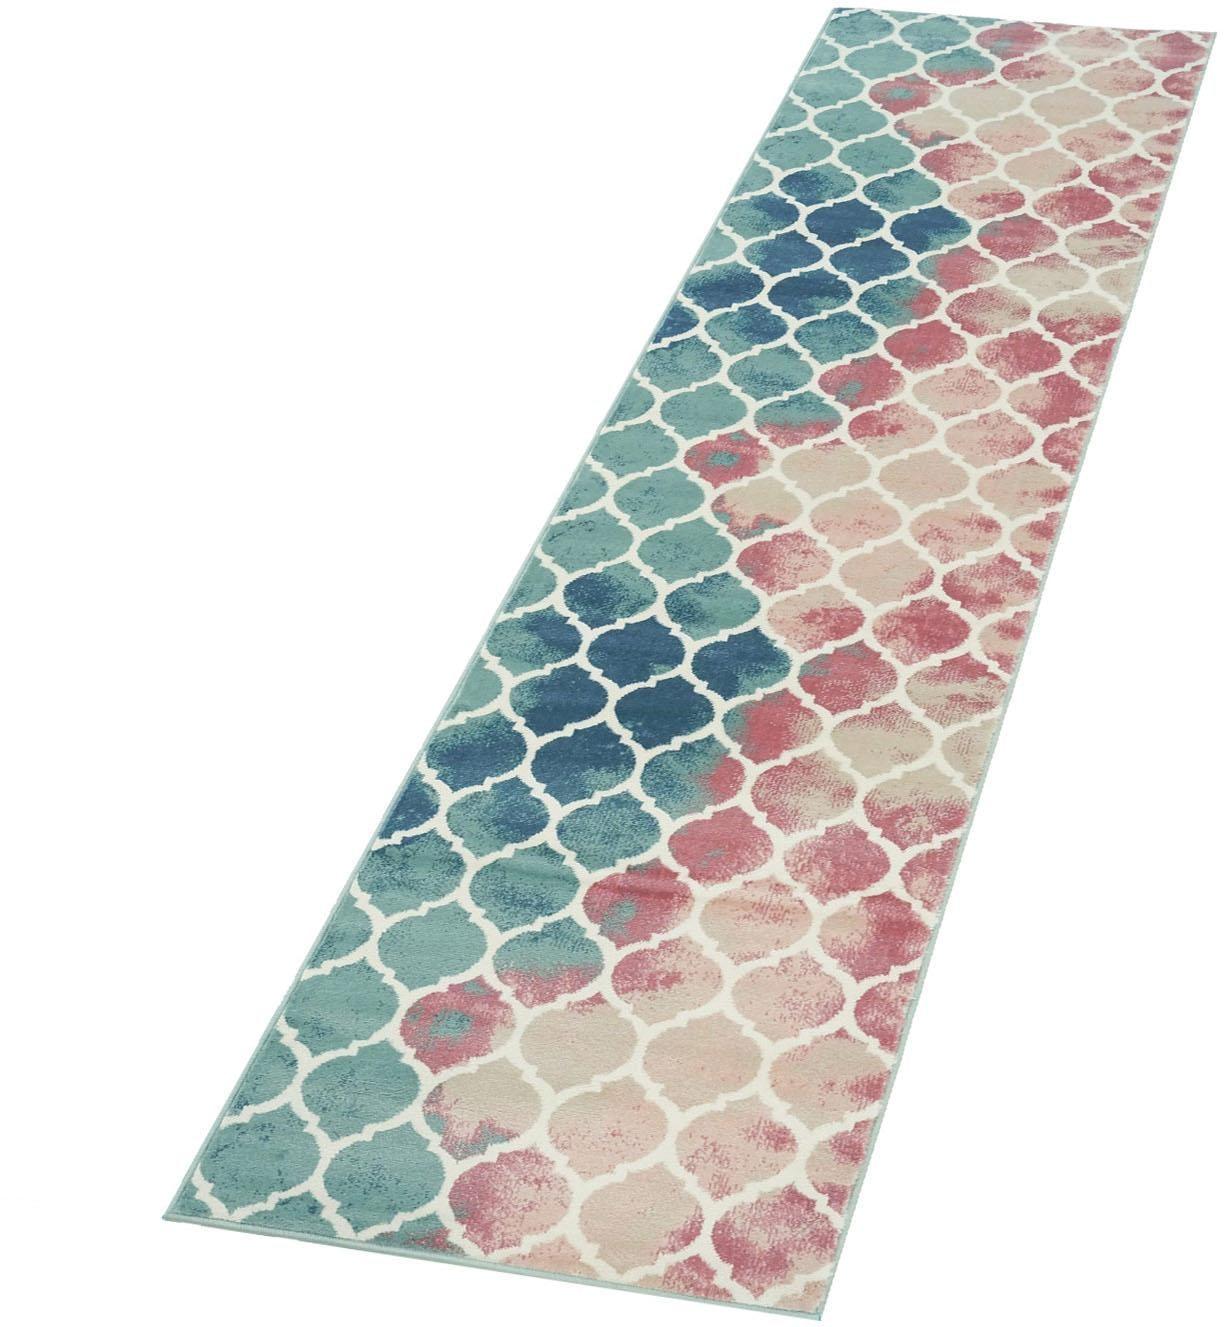 Läufer Inspiration 5796 Carpet City rechteckig Höhe 11 mm maschinell zusammengesetzt